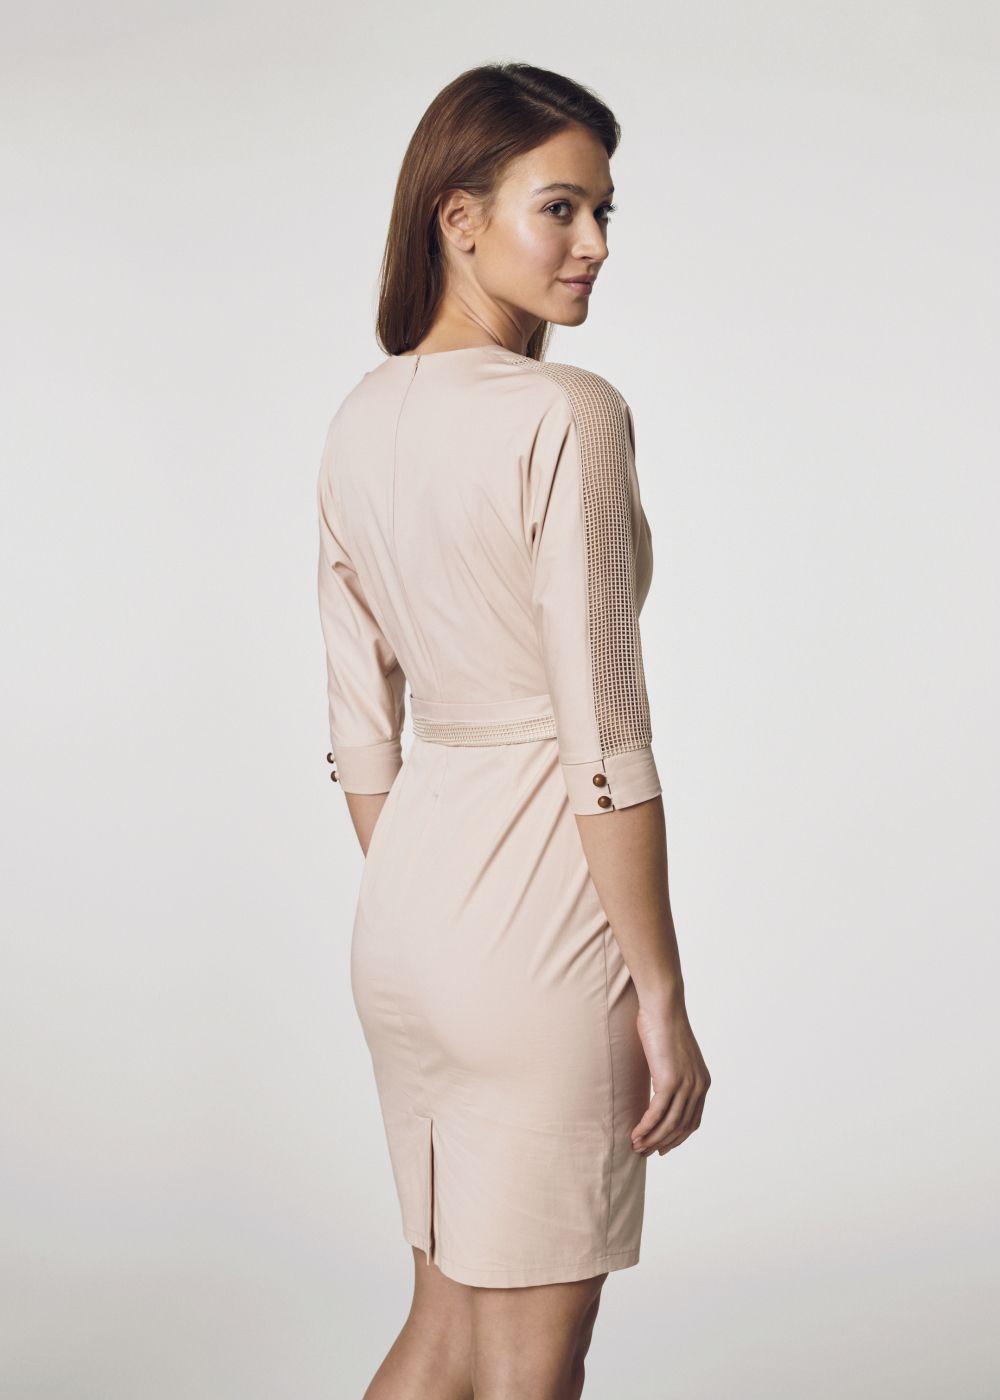 Sukienka damska SUKDT-0095-81(W21)